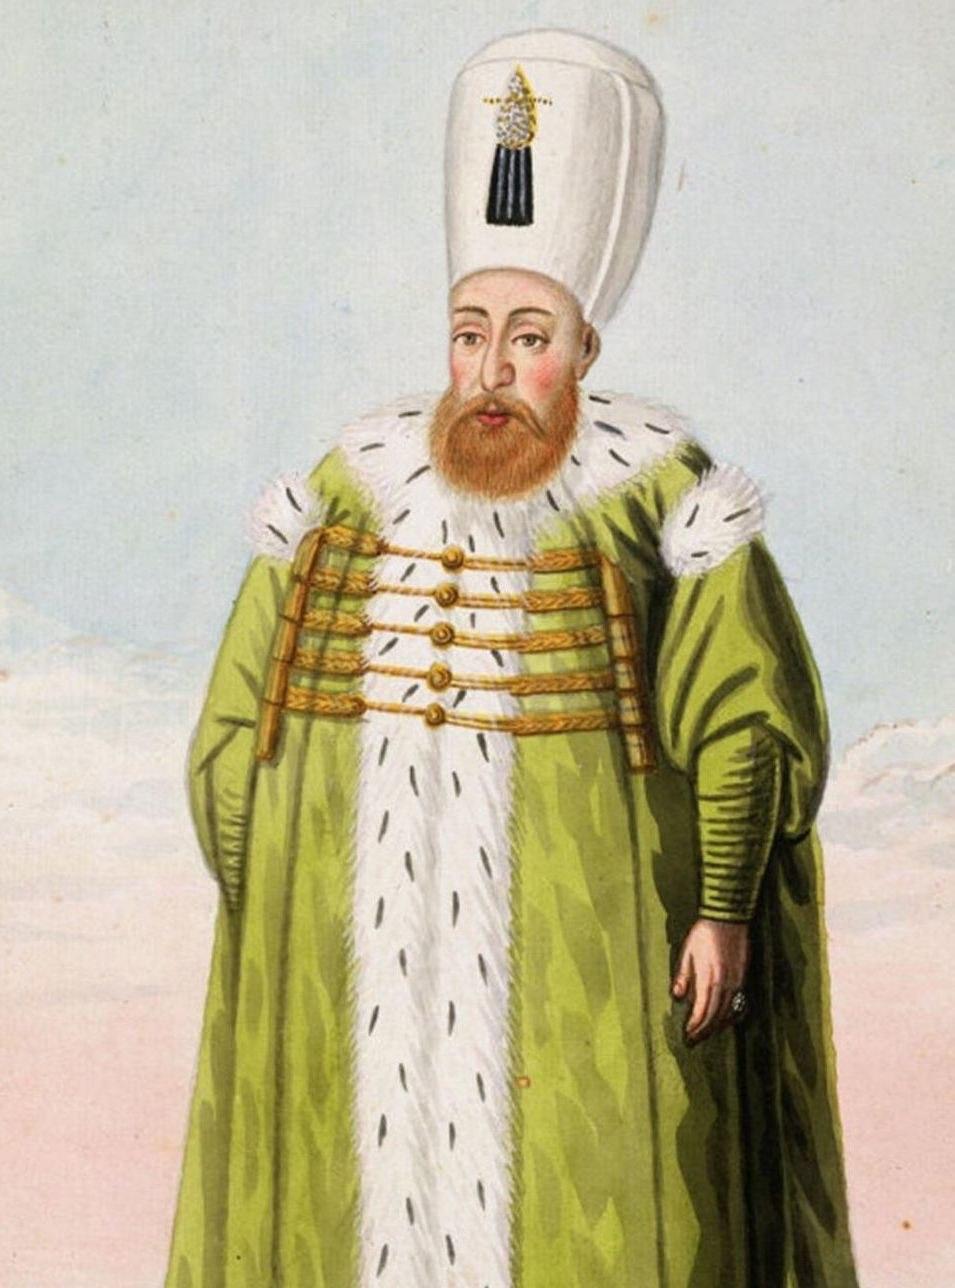 Mustafa I by John Young (cropped)